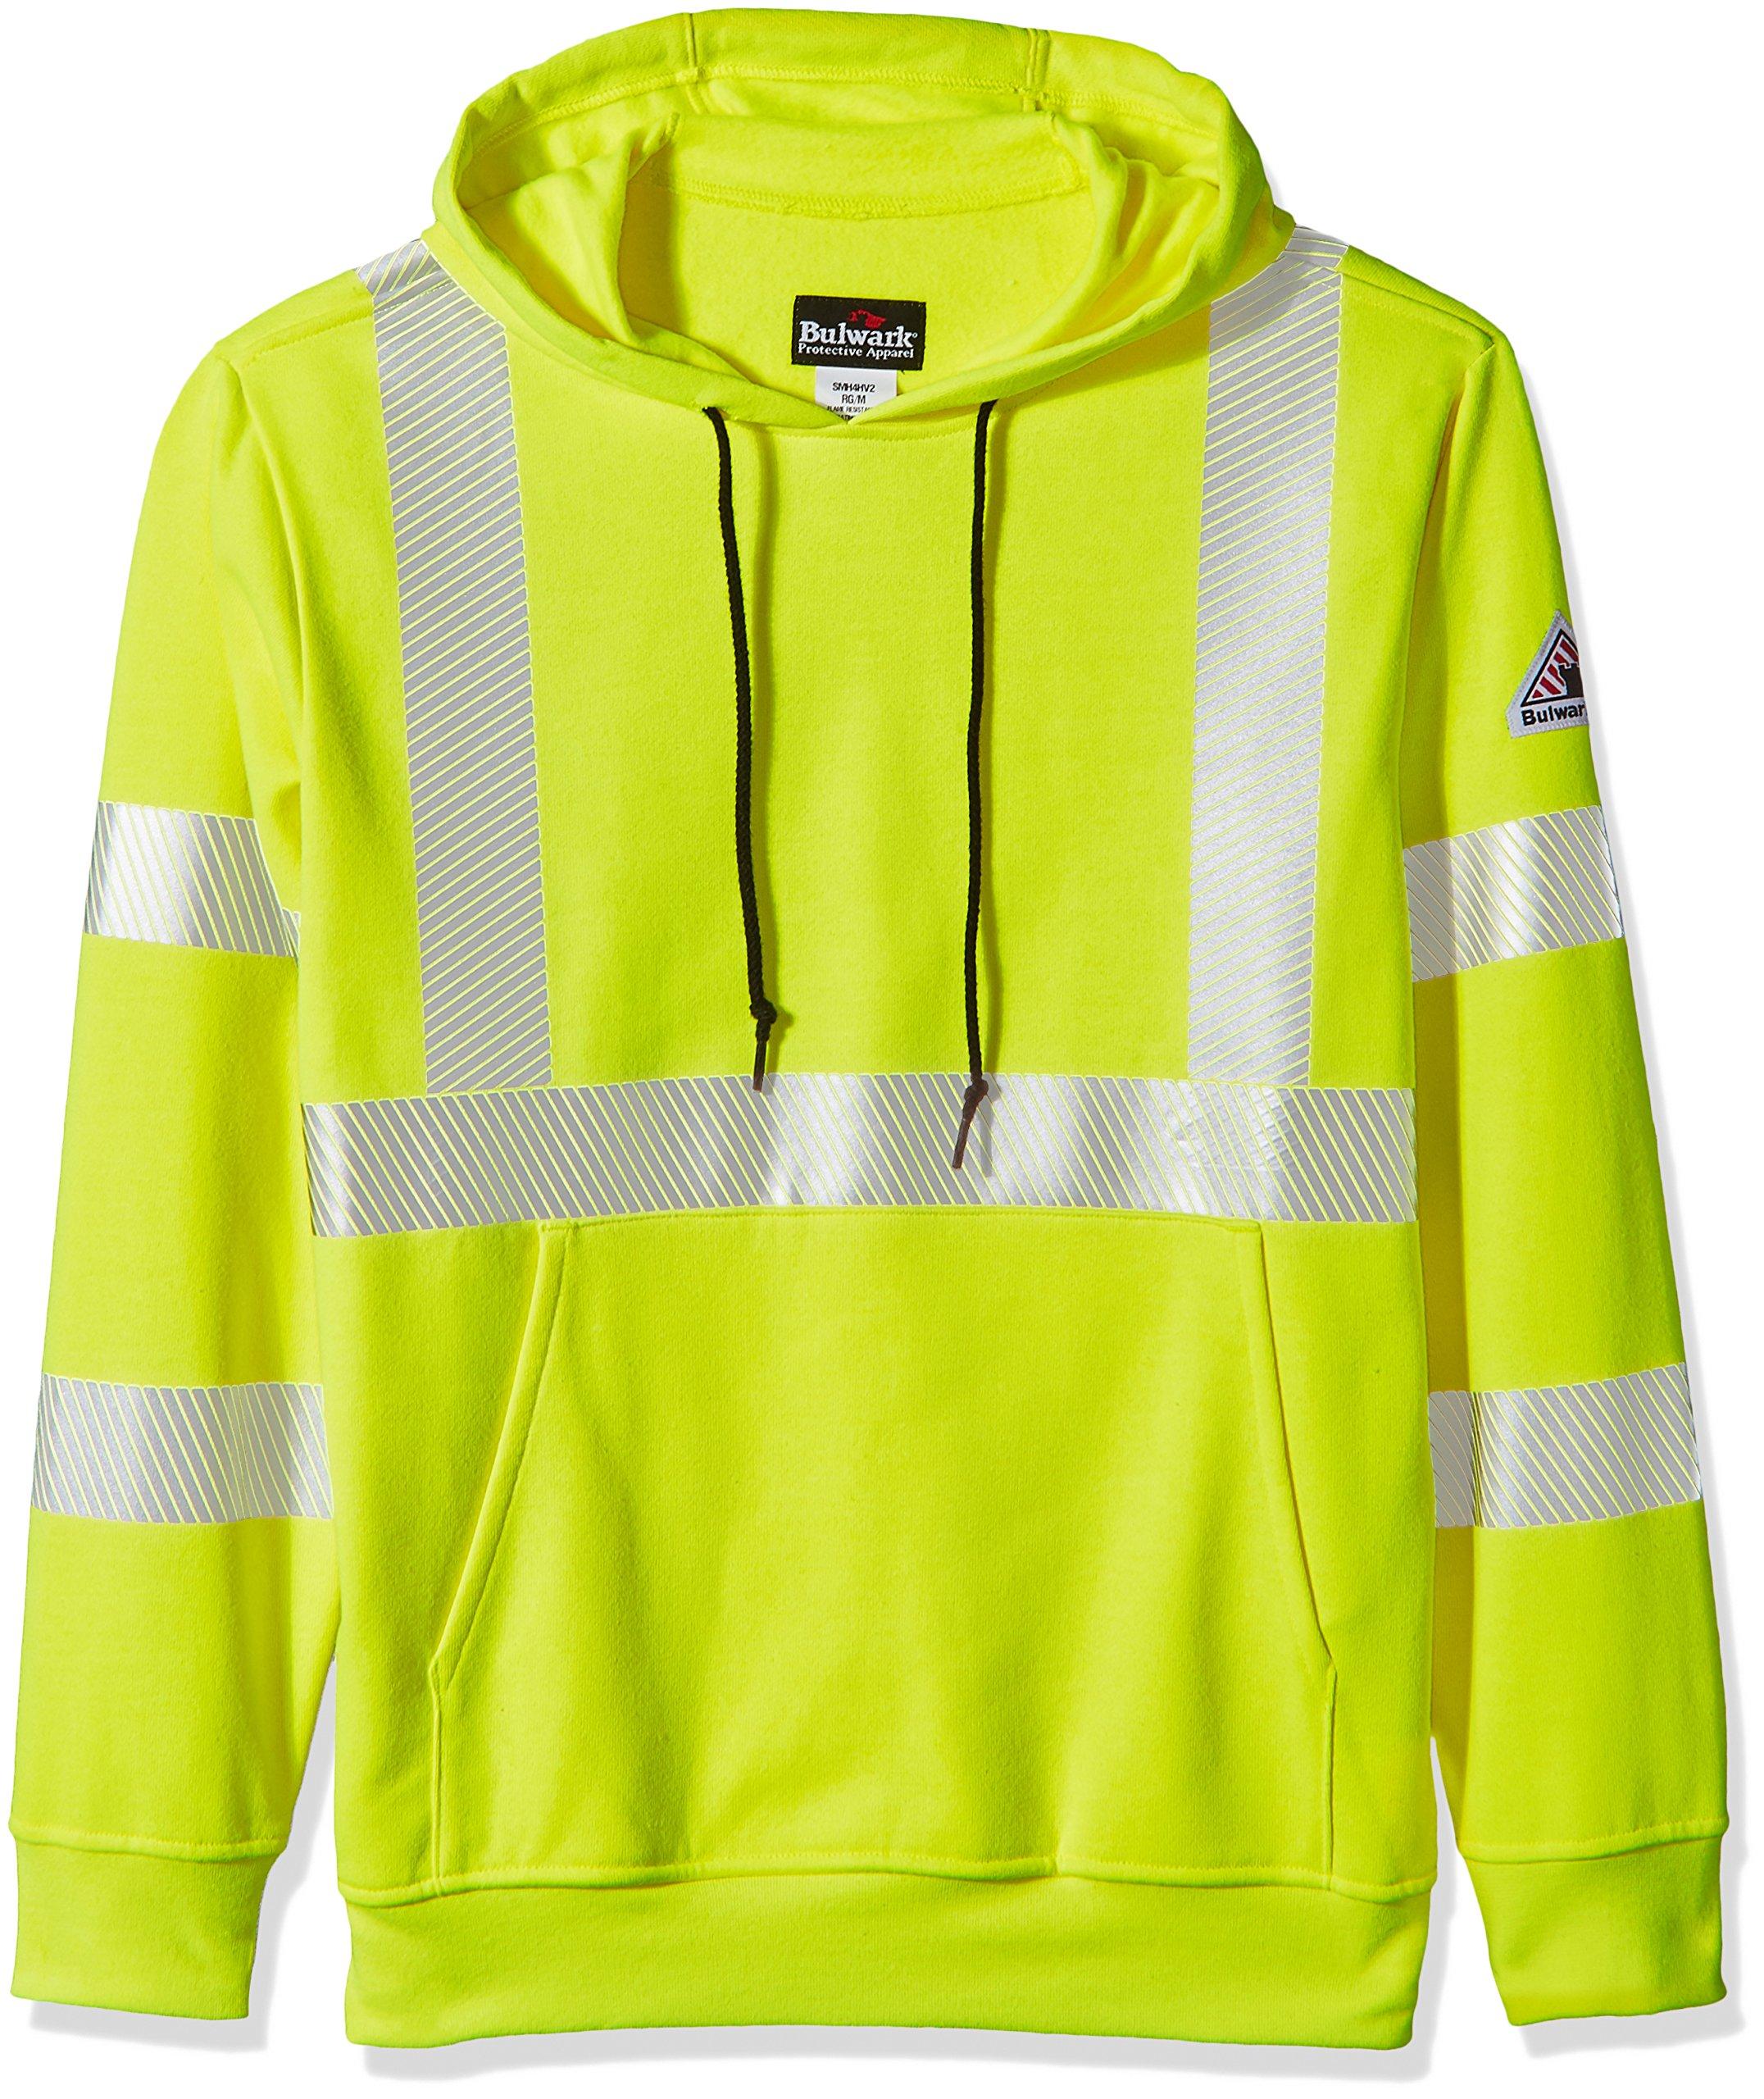 Bulwark Men's Hi-Visibility Pullover Hooded Fleece Sweatshirt, Yellow/Green, X-Large